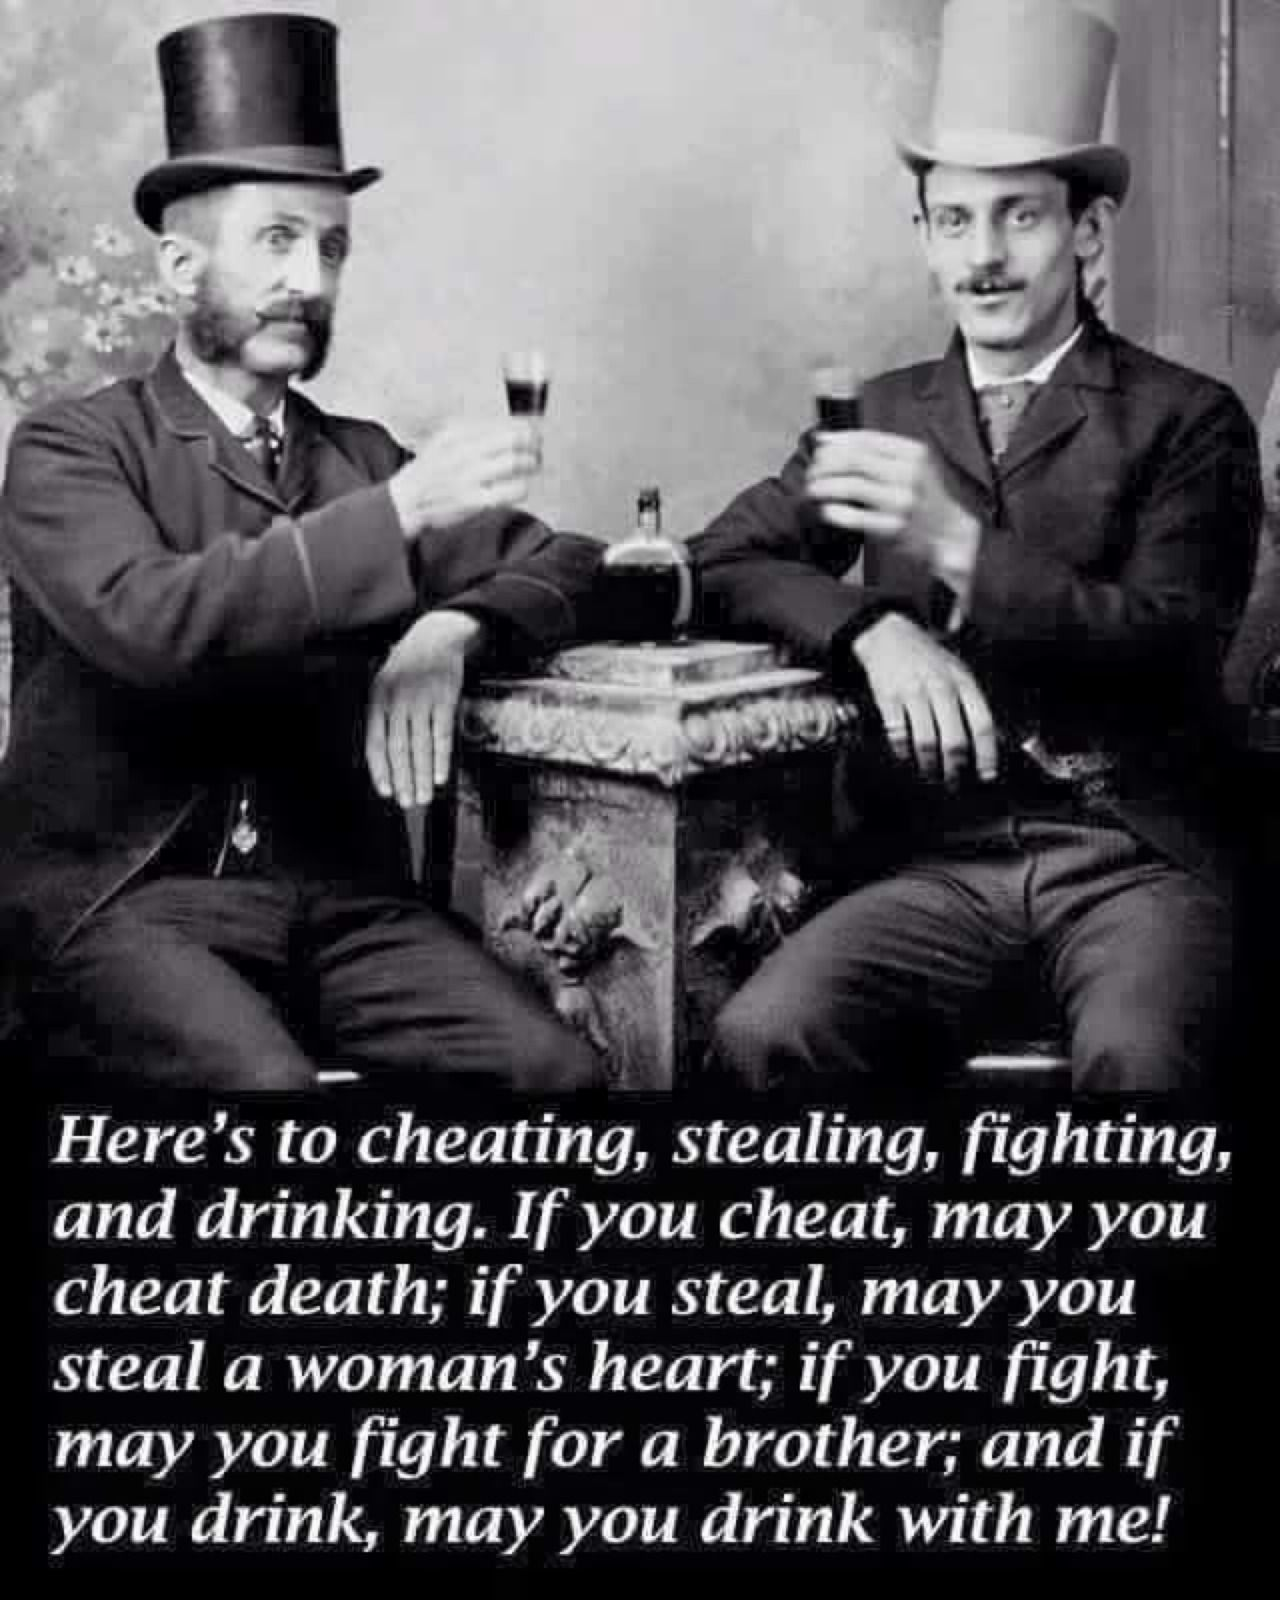 Do not argue with a drunk Irishman